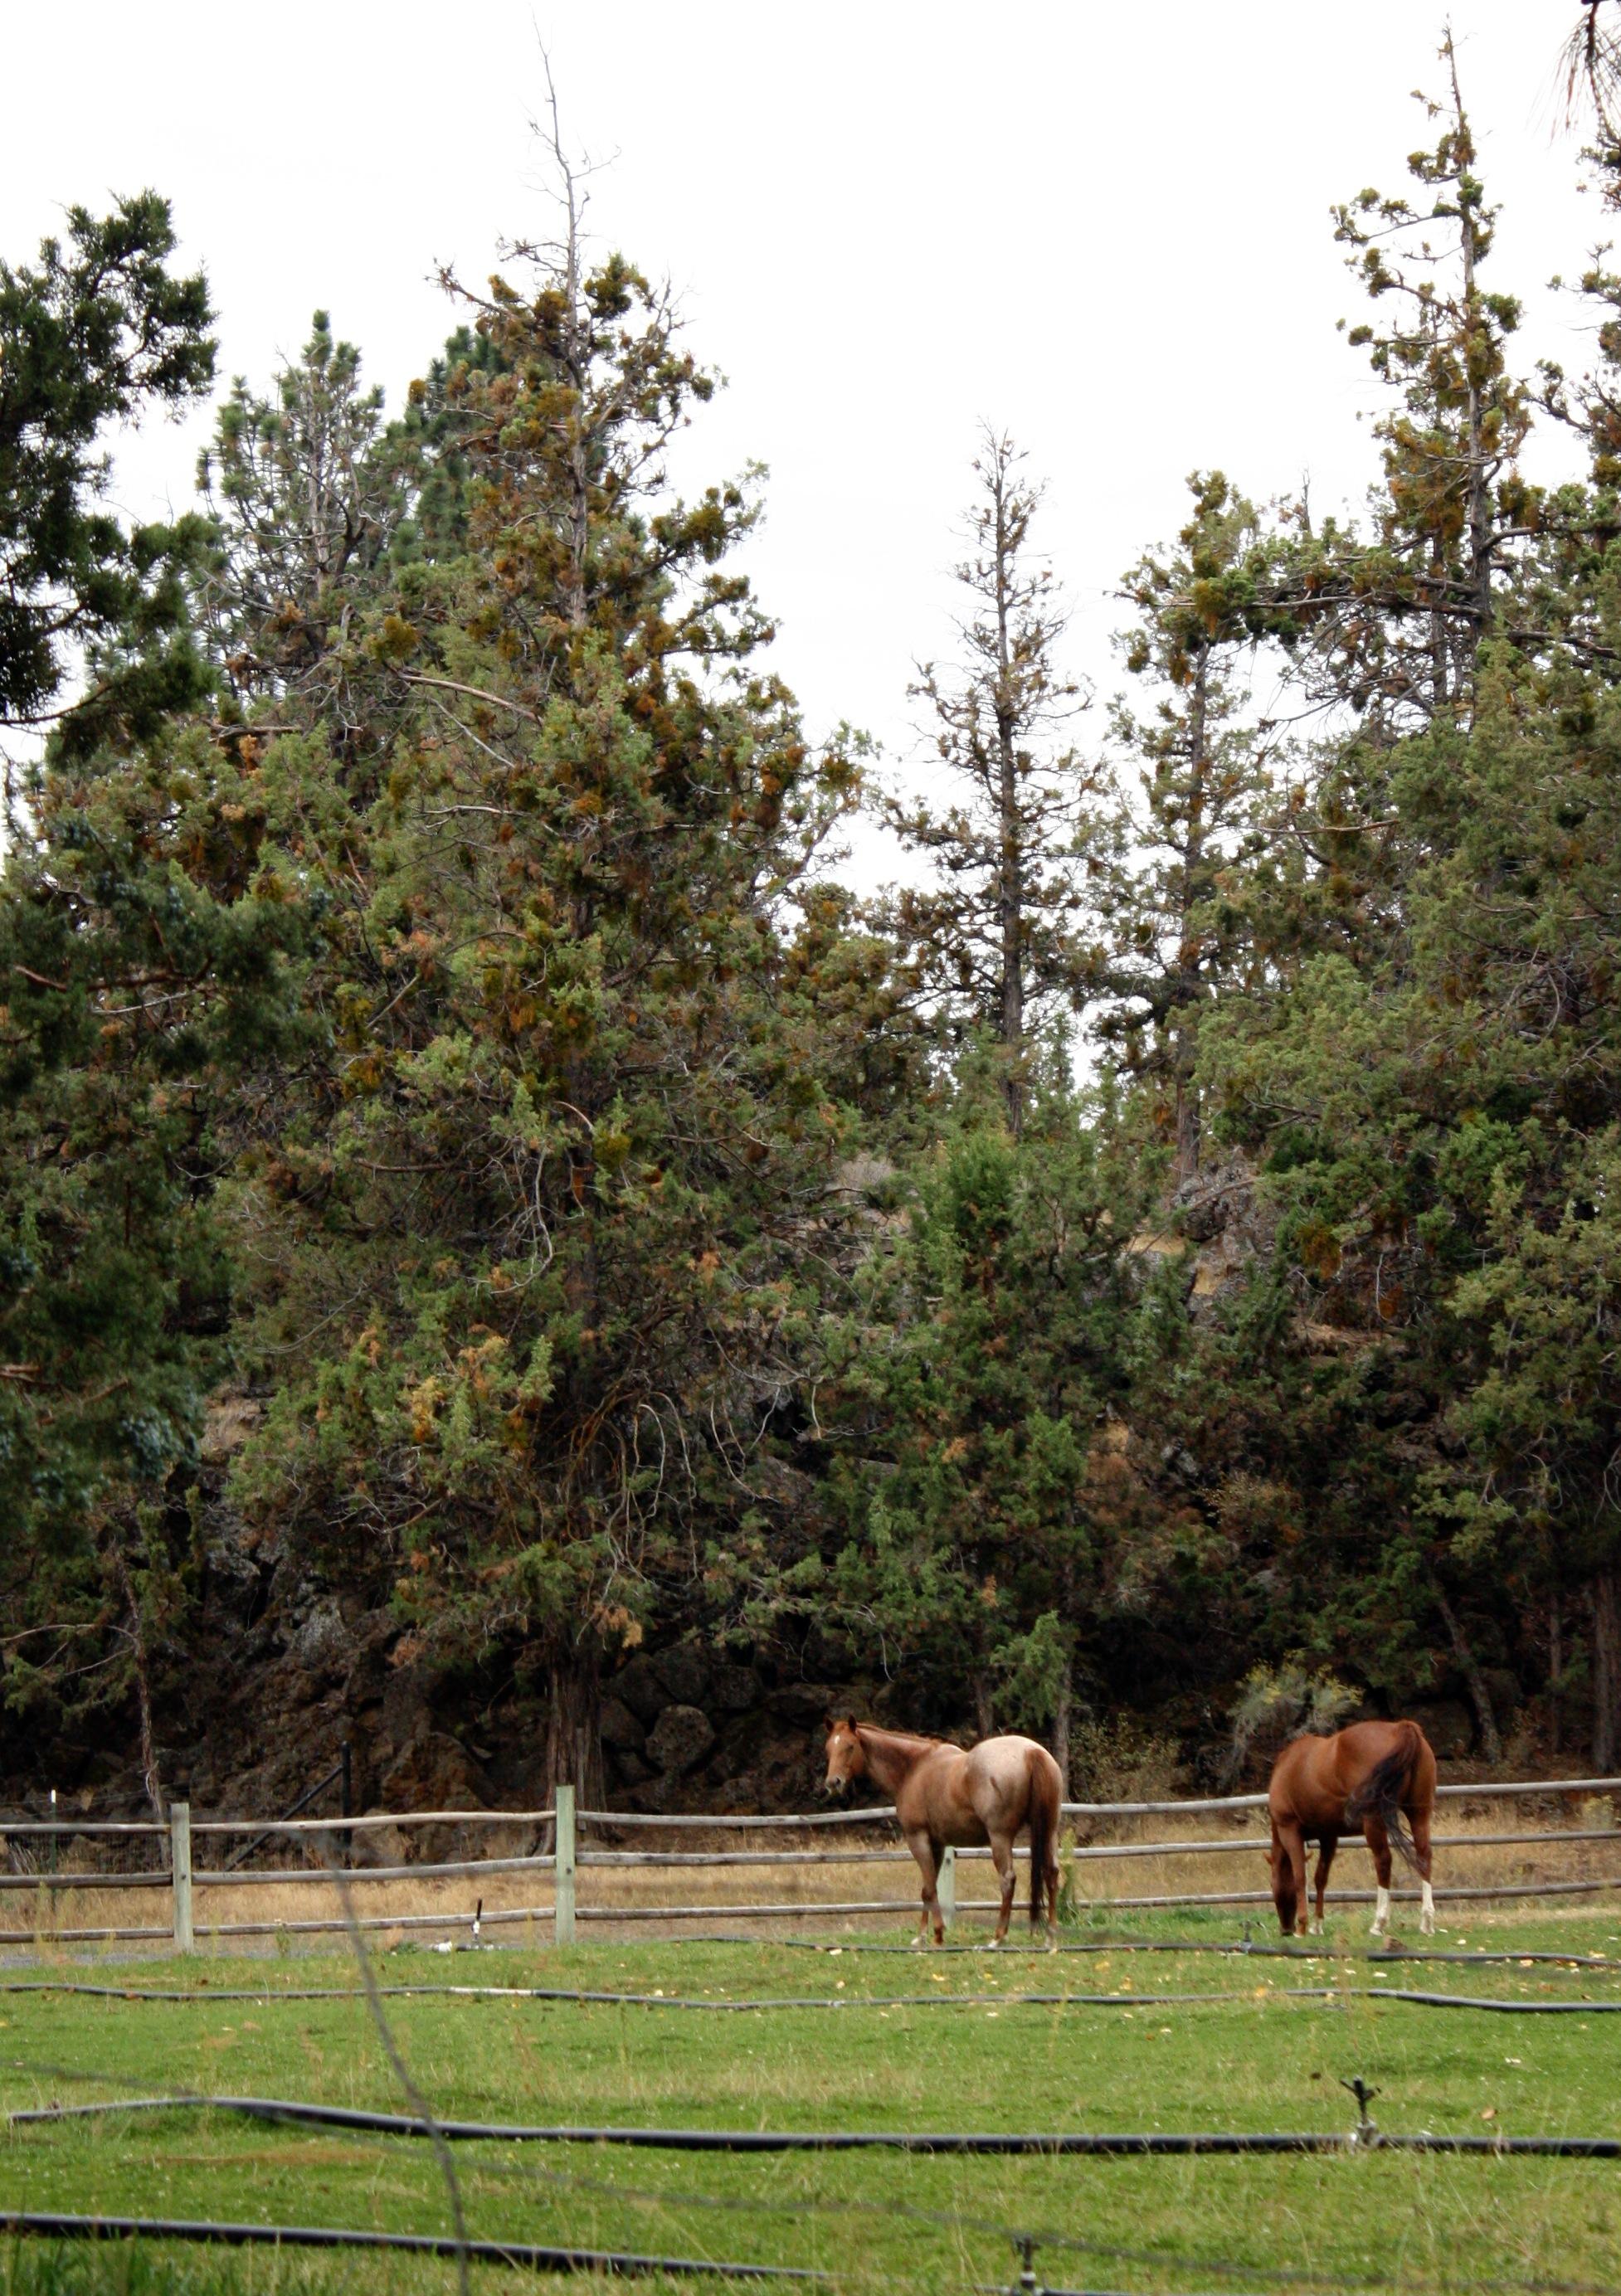 Horses-Bend_heatherbyhand.jpg